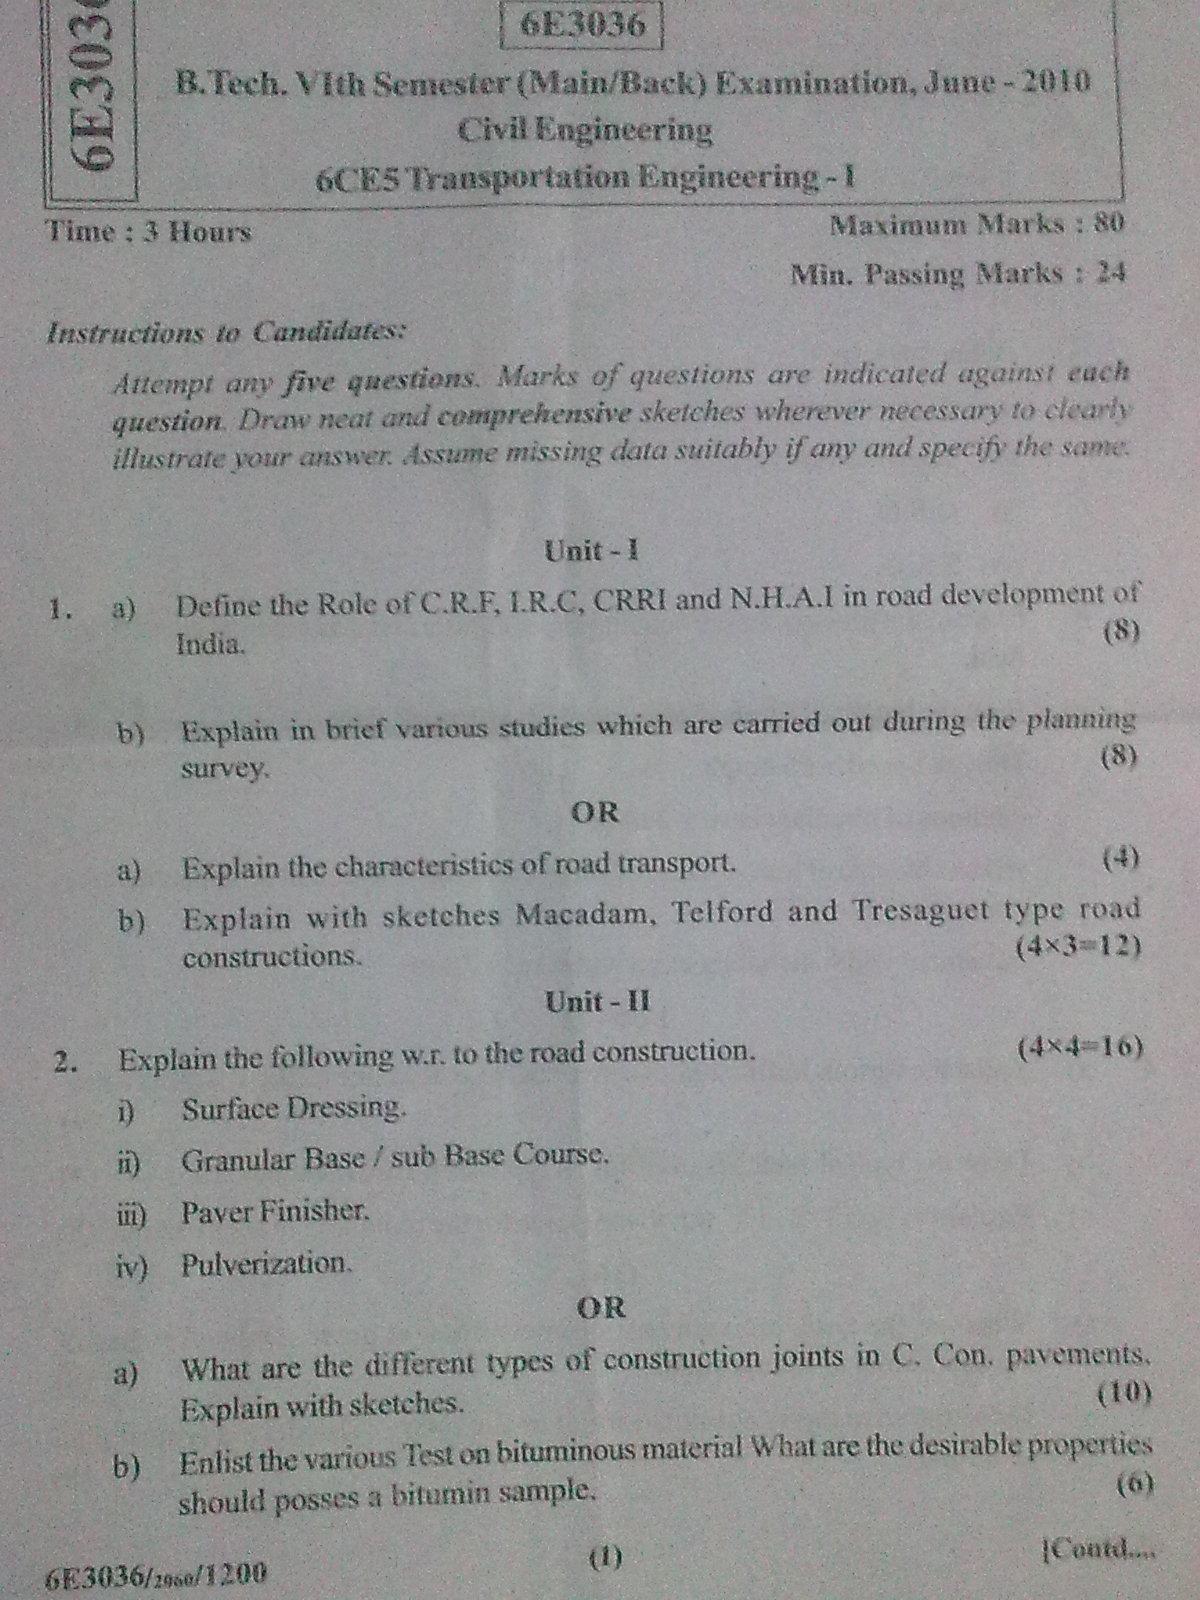 rajasthan technical university transportation engineering i